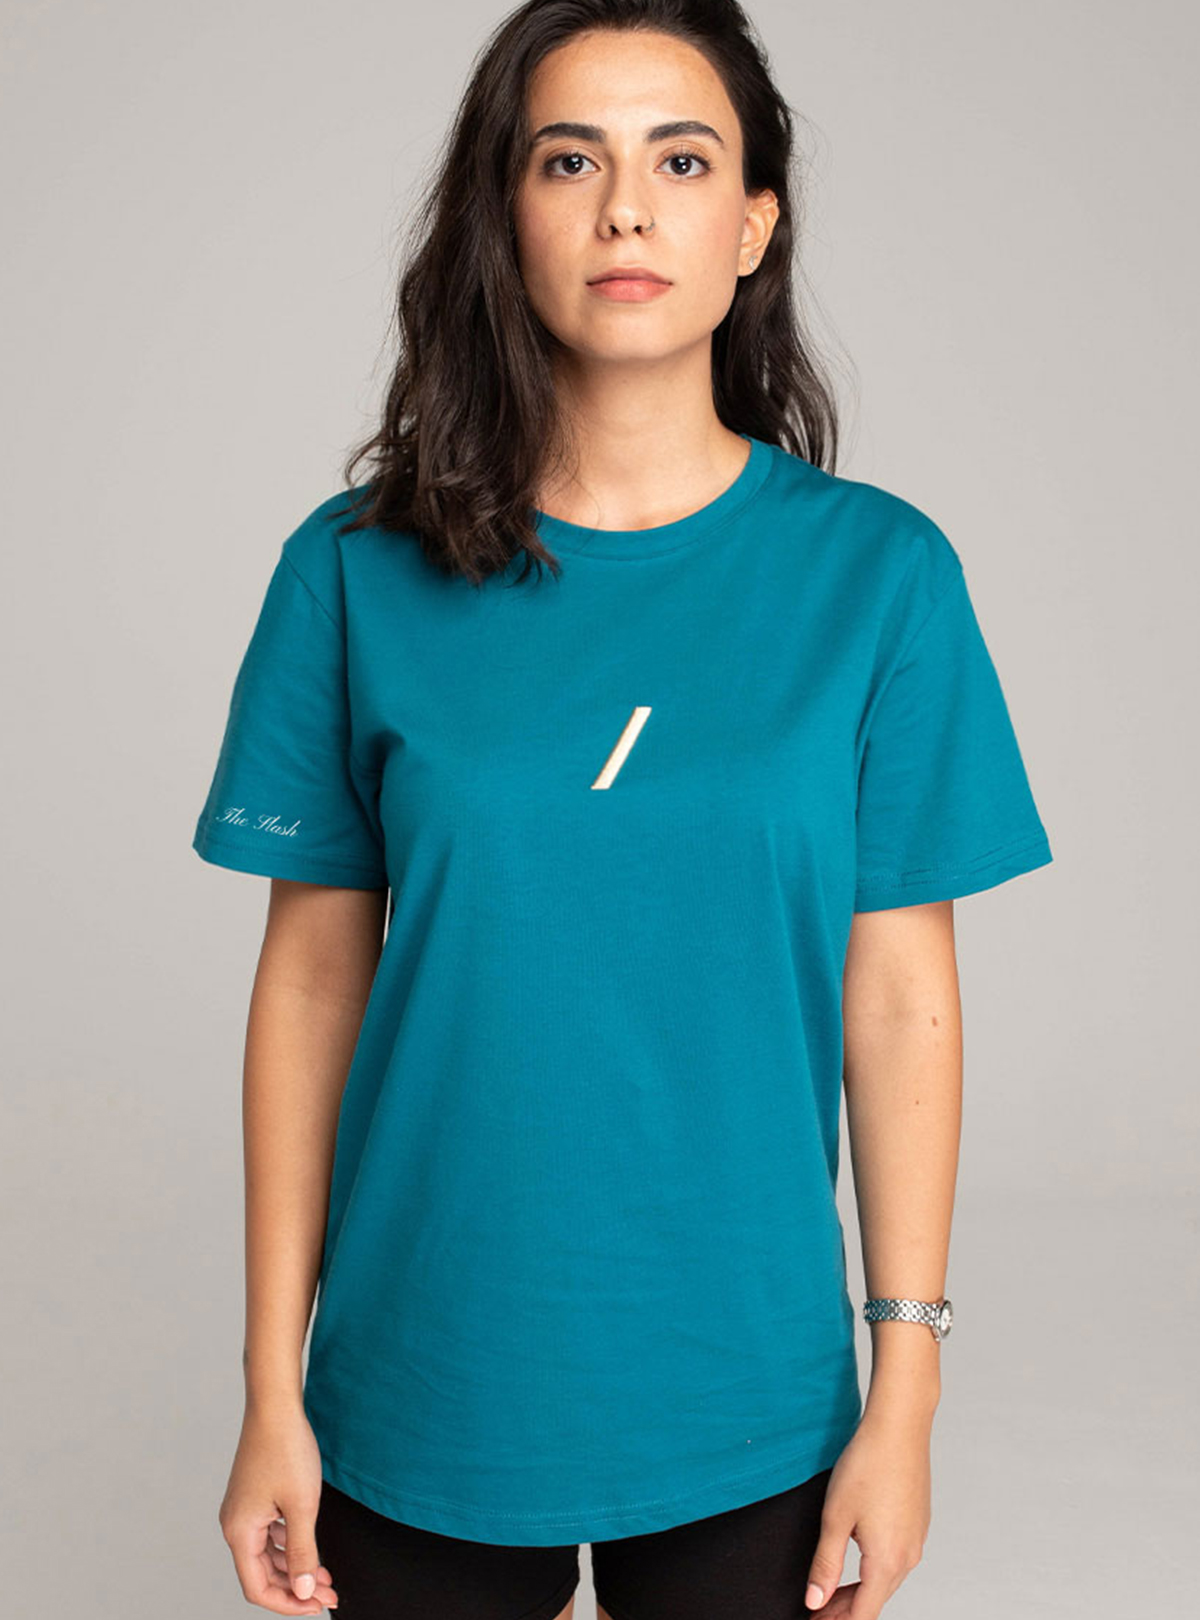 The Basic Collection Kadın - Tshirt Petrol